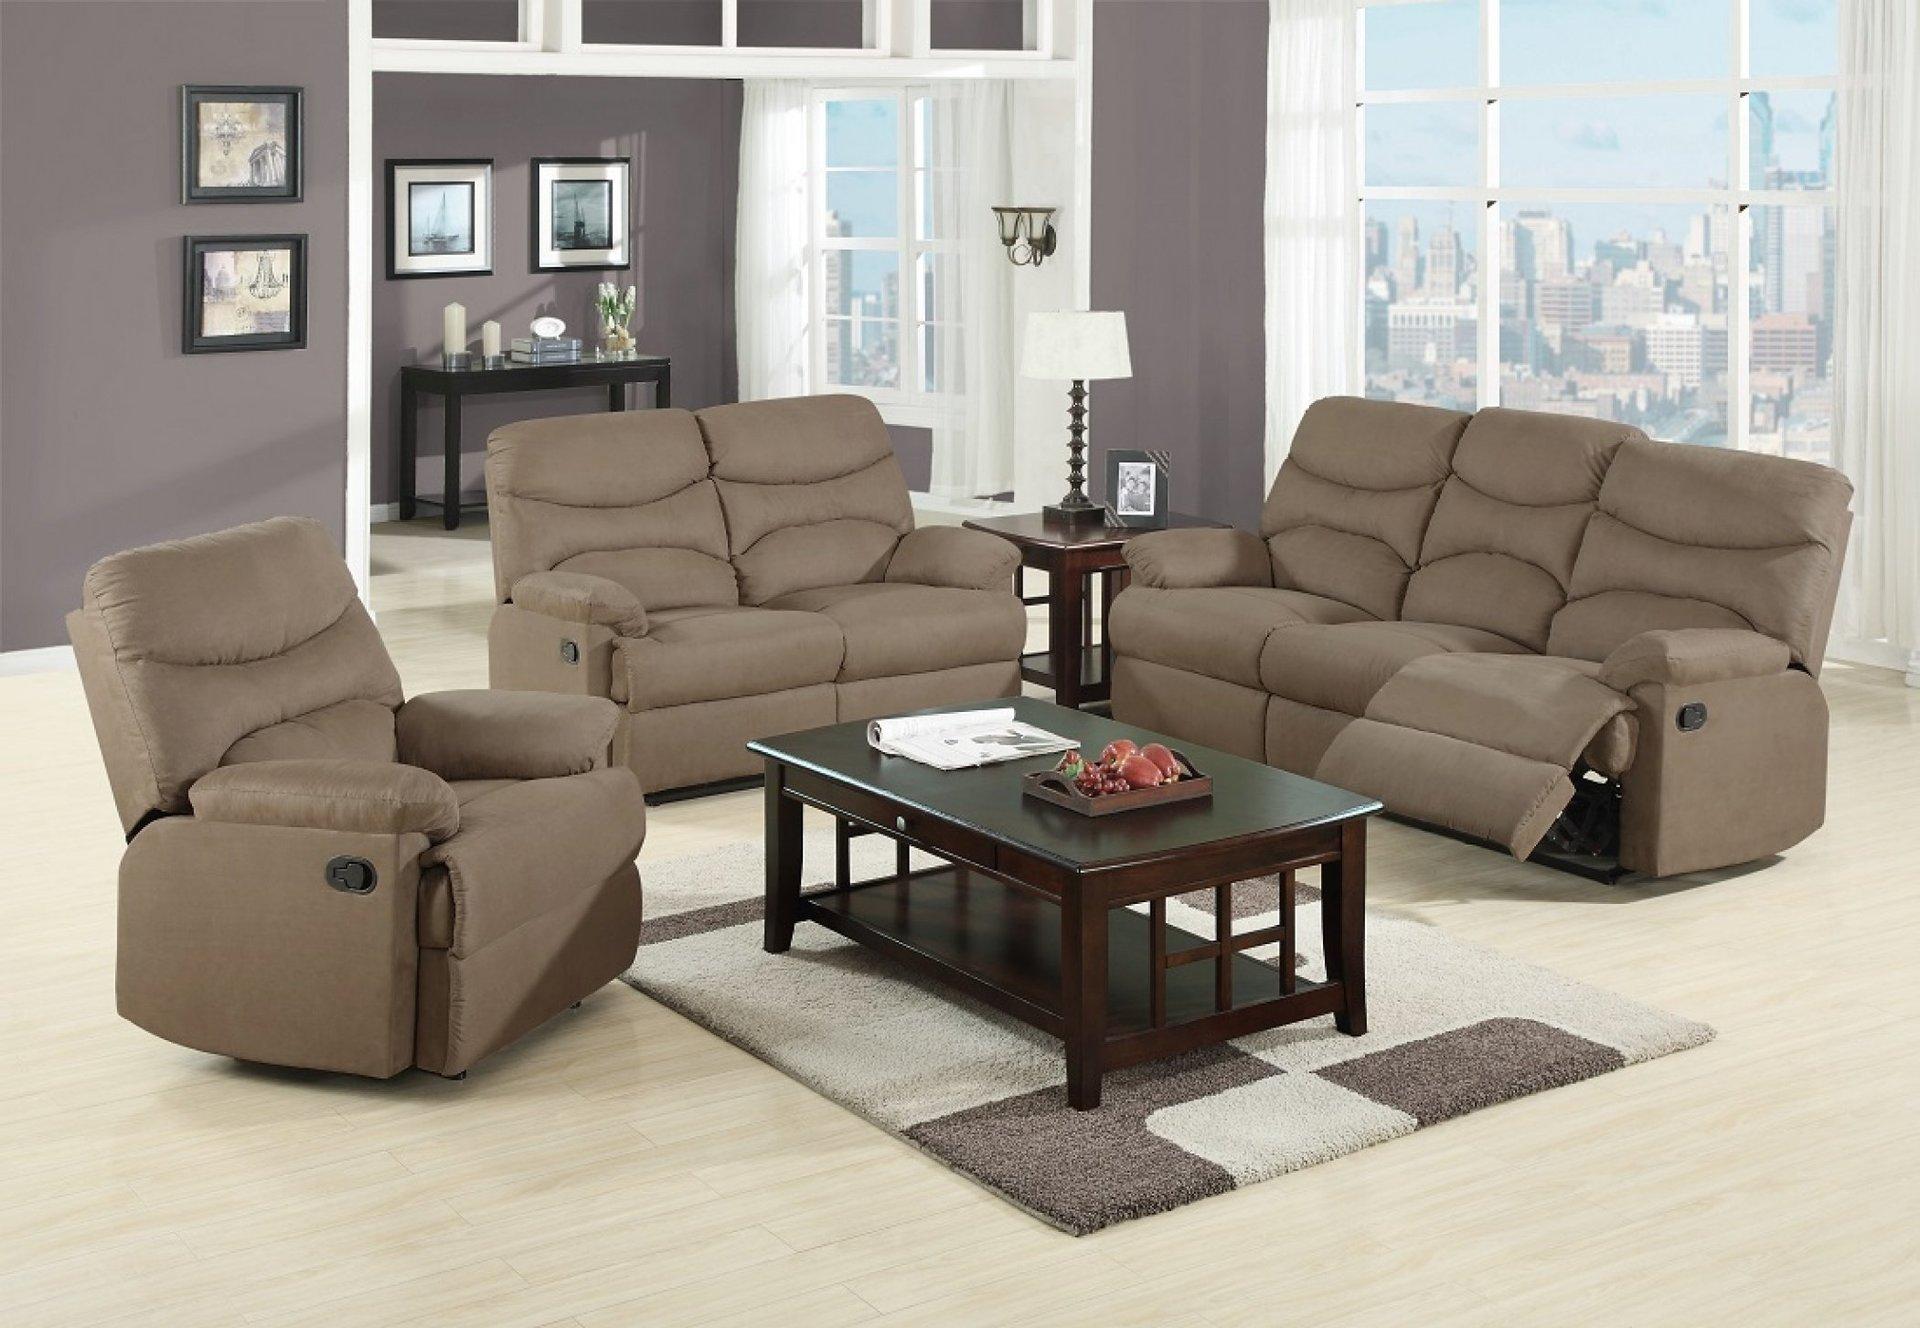 84 Xl Living Room Furniture Shaw Xl Sectional Rhf